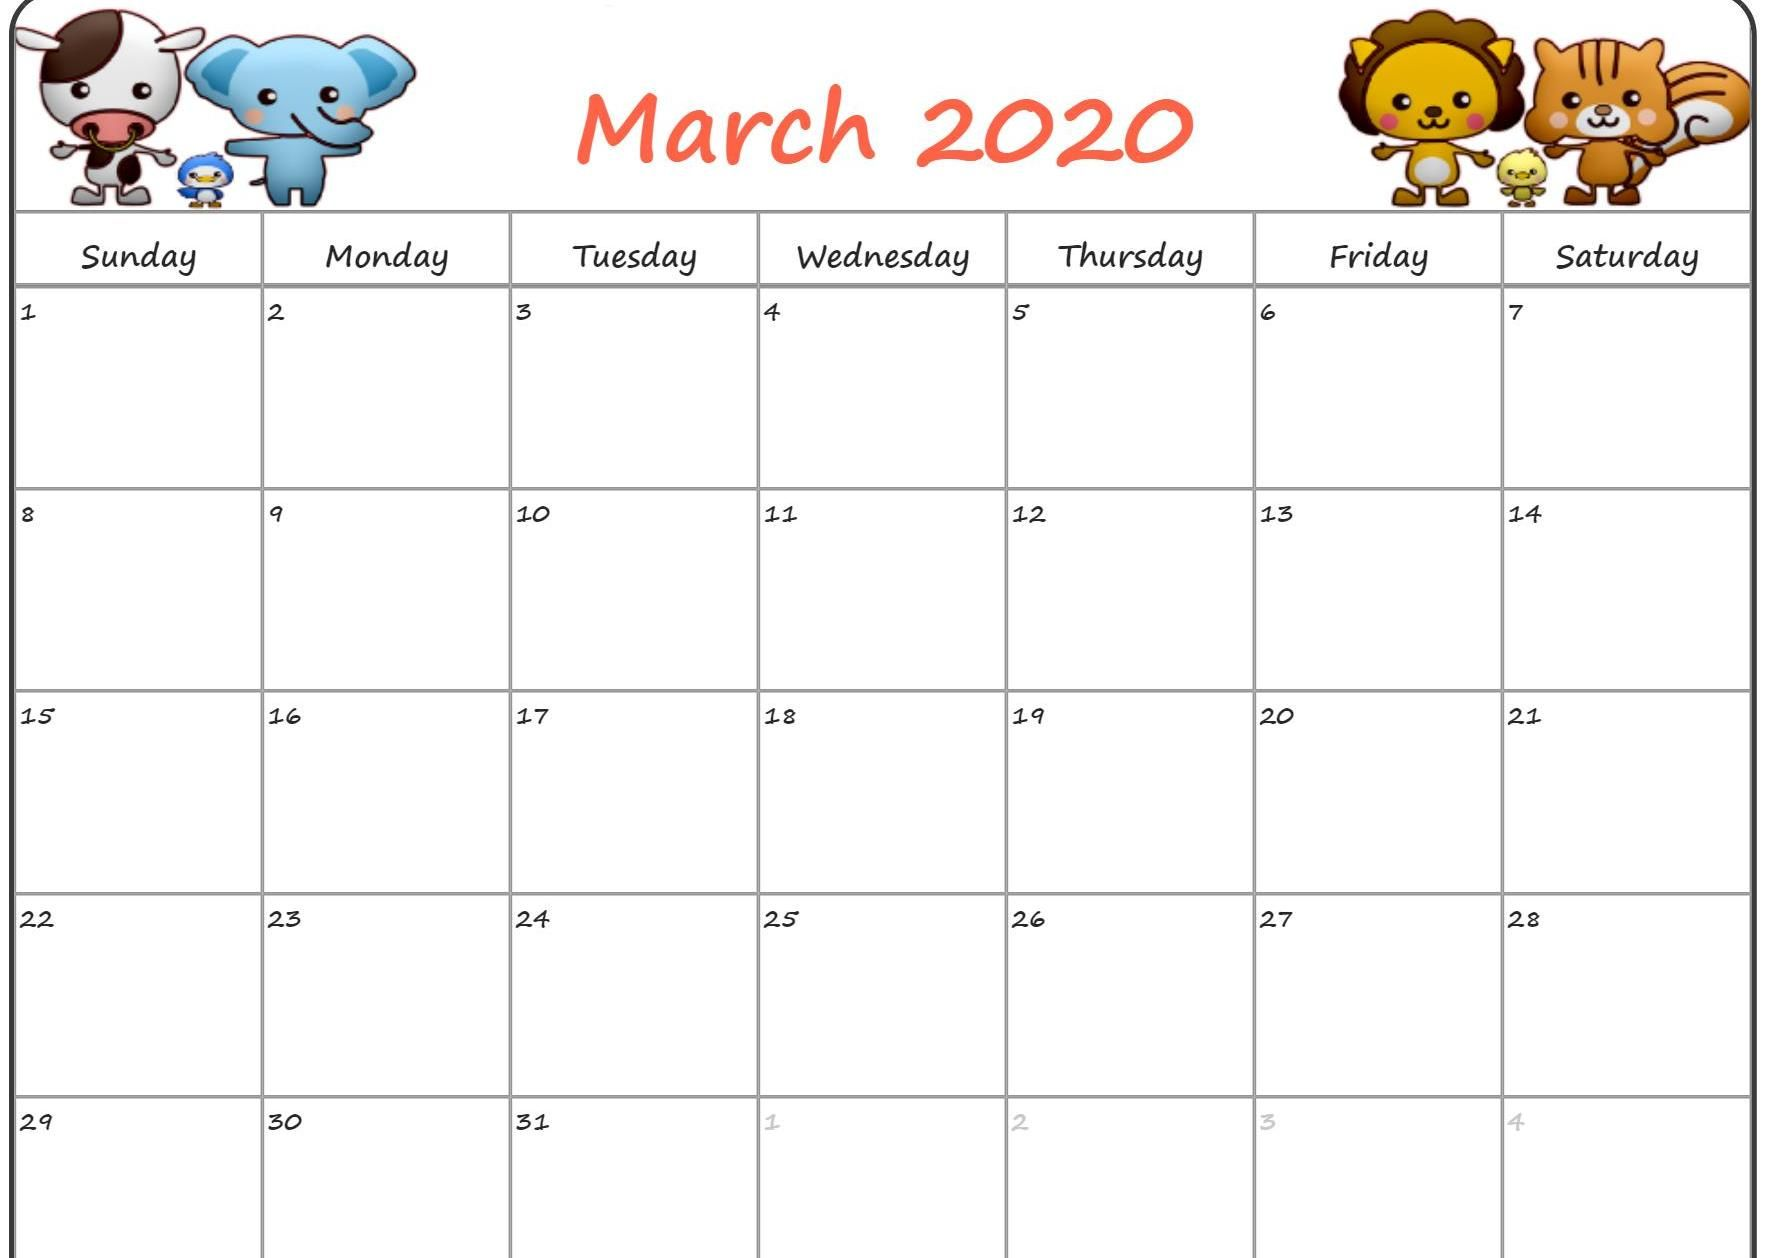 Cute March 2020 Calendar Floral Wallpaper Desk Images Free